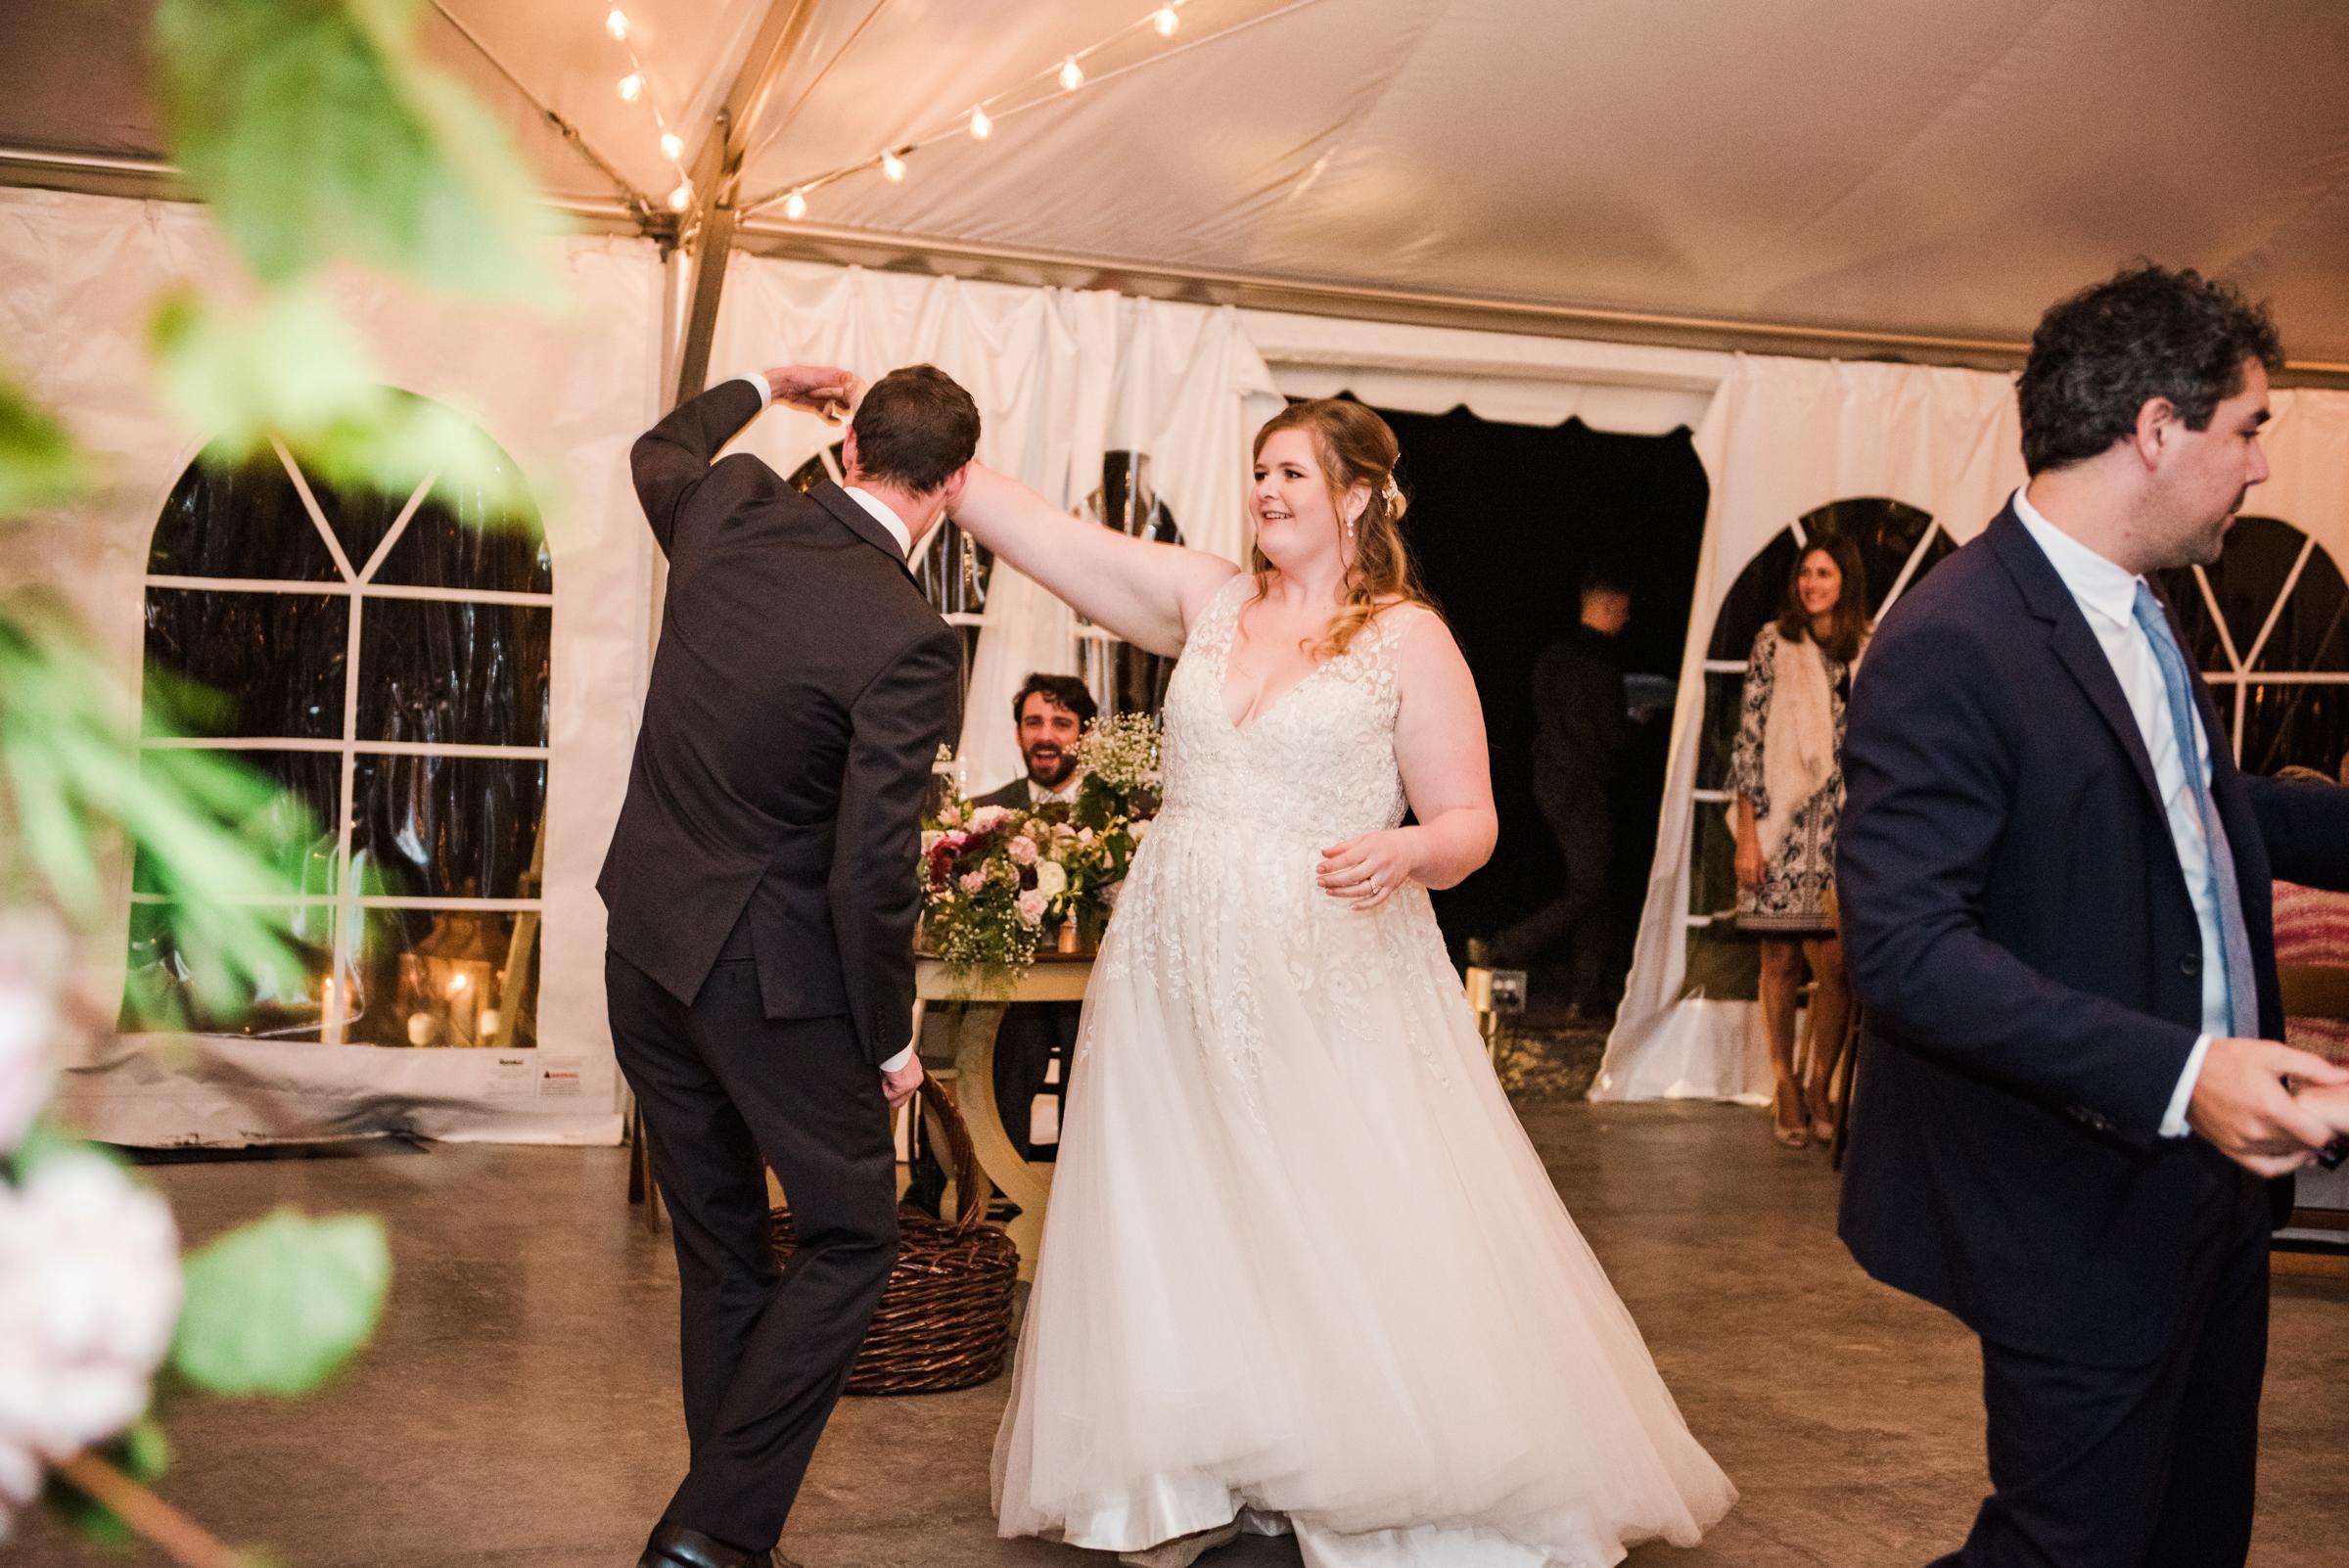 Zugibe_Vineyards_Finger_Lakes_Wedding_JILL_STUDIO_Rochester_NY_Photographer_DSC_4343.jpg